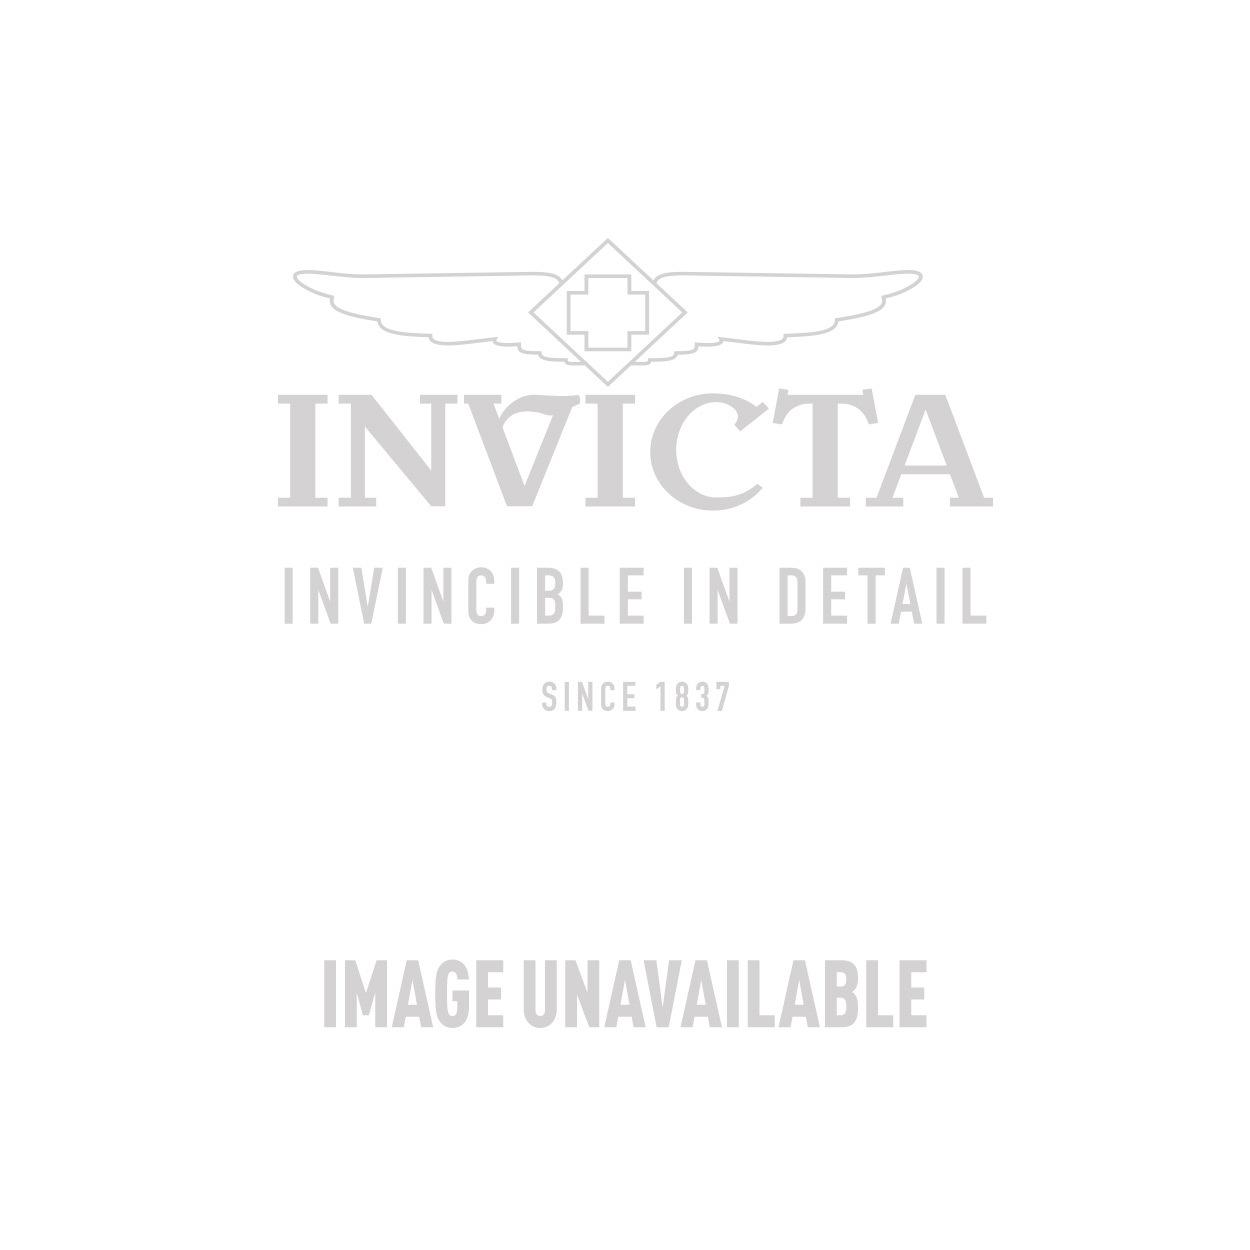 Invicta Specialty Quartz Watch - Gold case with Black tone Polyurethane band - Model 1792